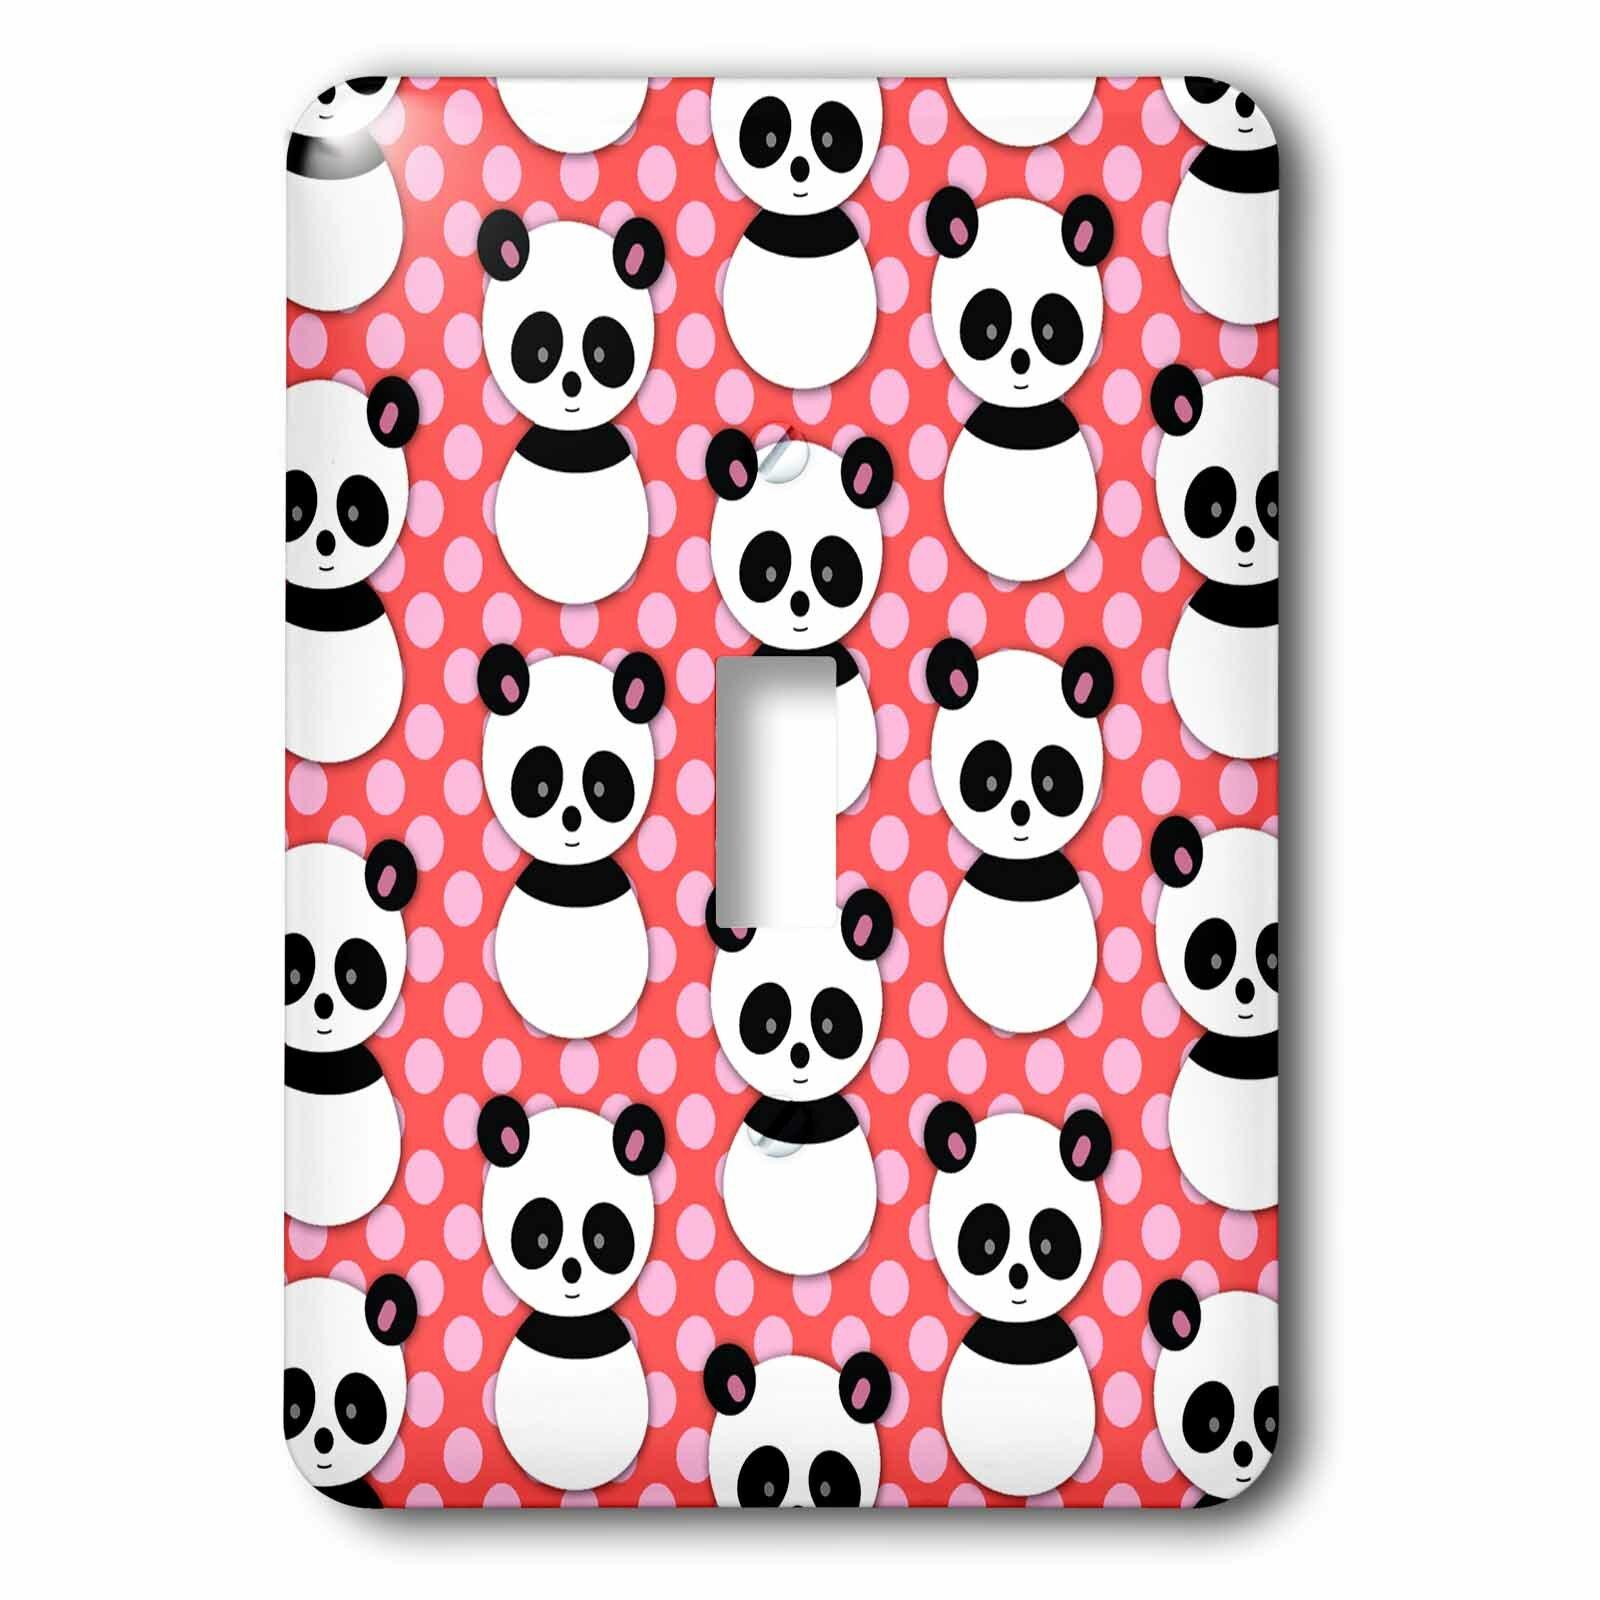 Cute Panda Decorative Outlet Duplex Light Switch Plate Cover Handmade Products Kolenik Home Kitchen